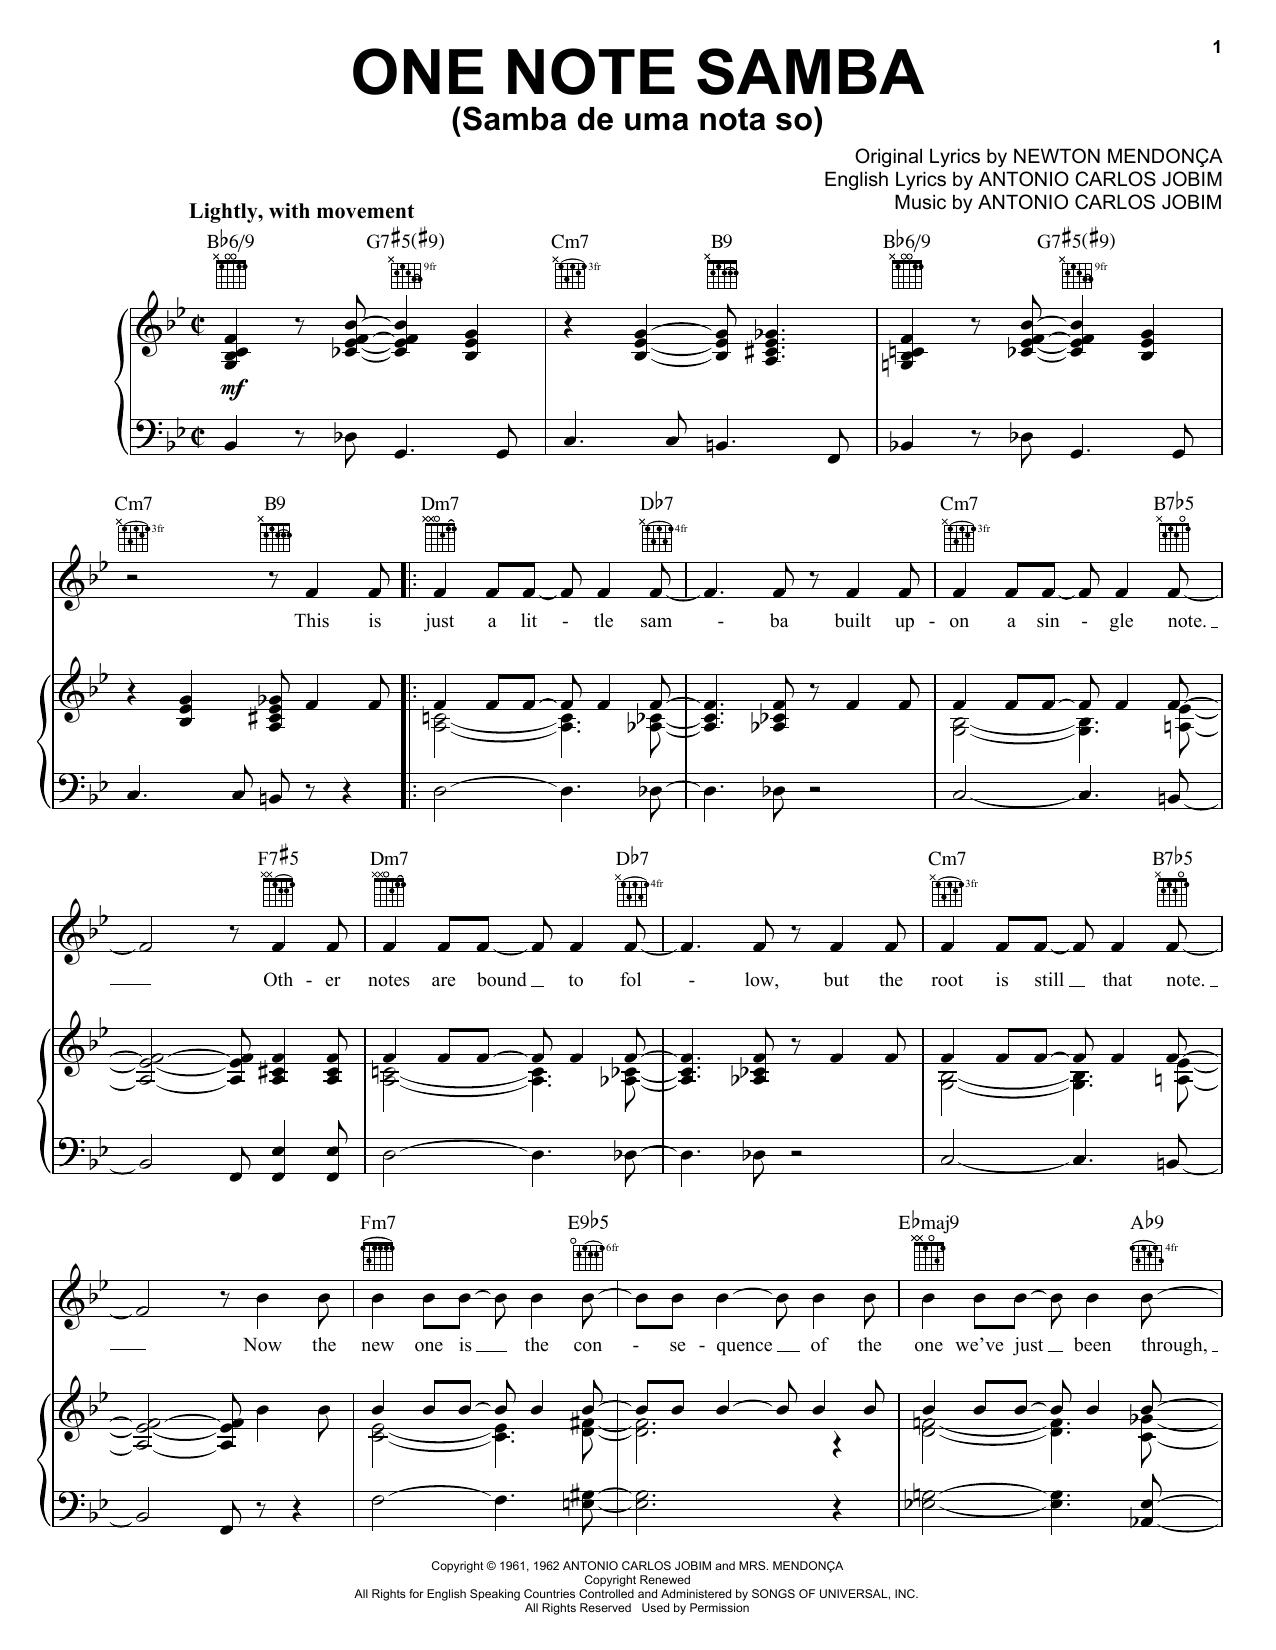 Antonio Carlos Jobim One Note Samba (Samba De Uma Nota So) sheet music notes and chords. Download Printable PDF.